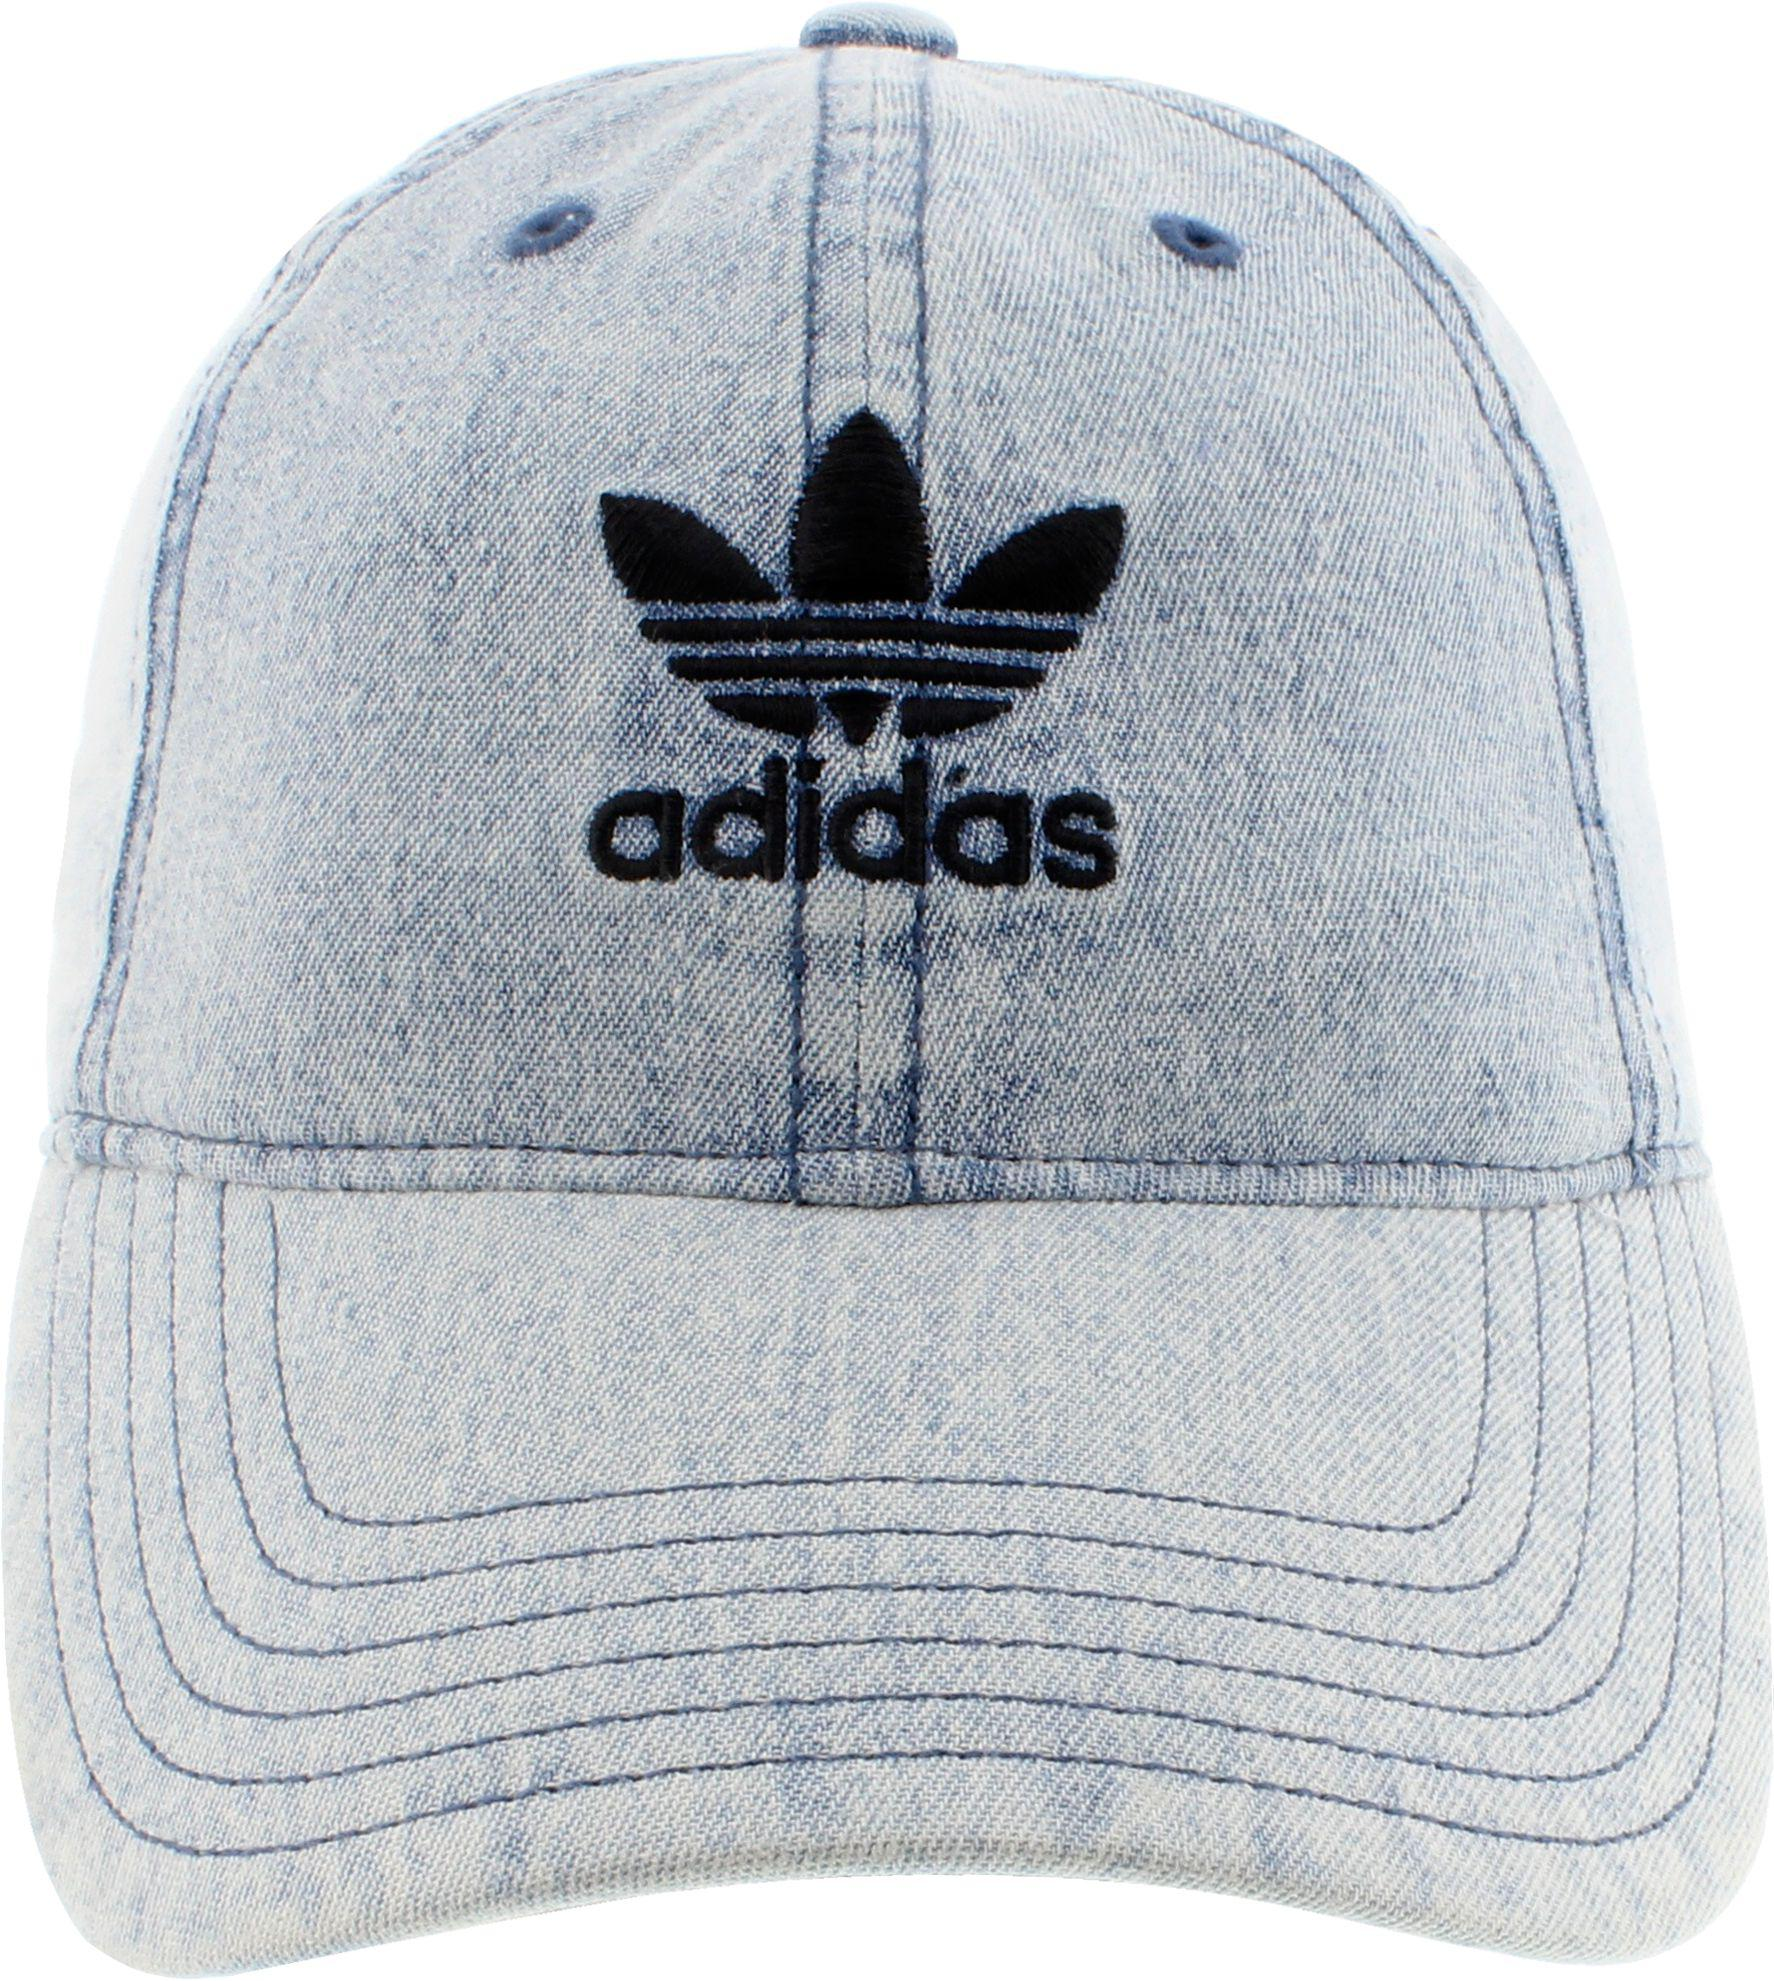 Adidas - Blue Originals Relaxed Denim Cap - Lyst. View fullscreen b1e7097c40f3